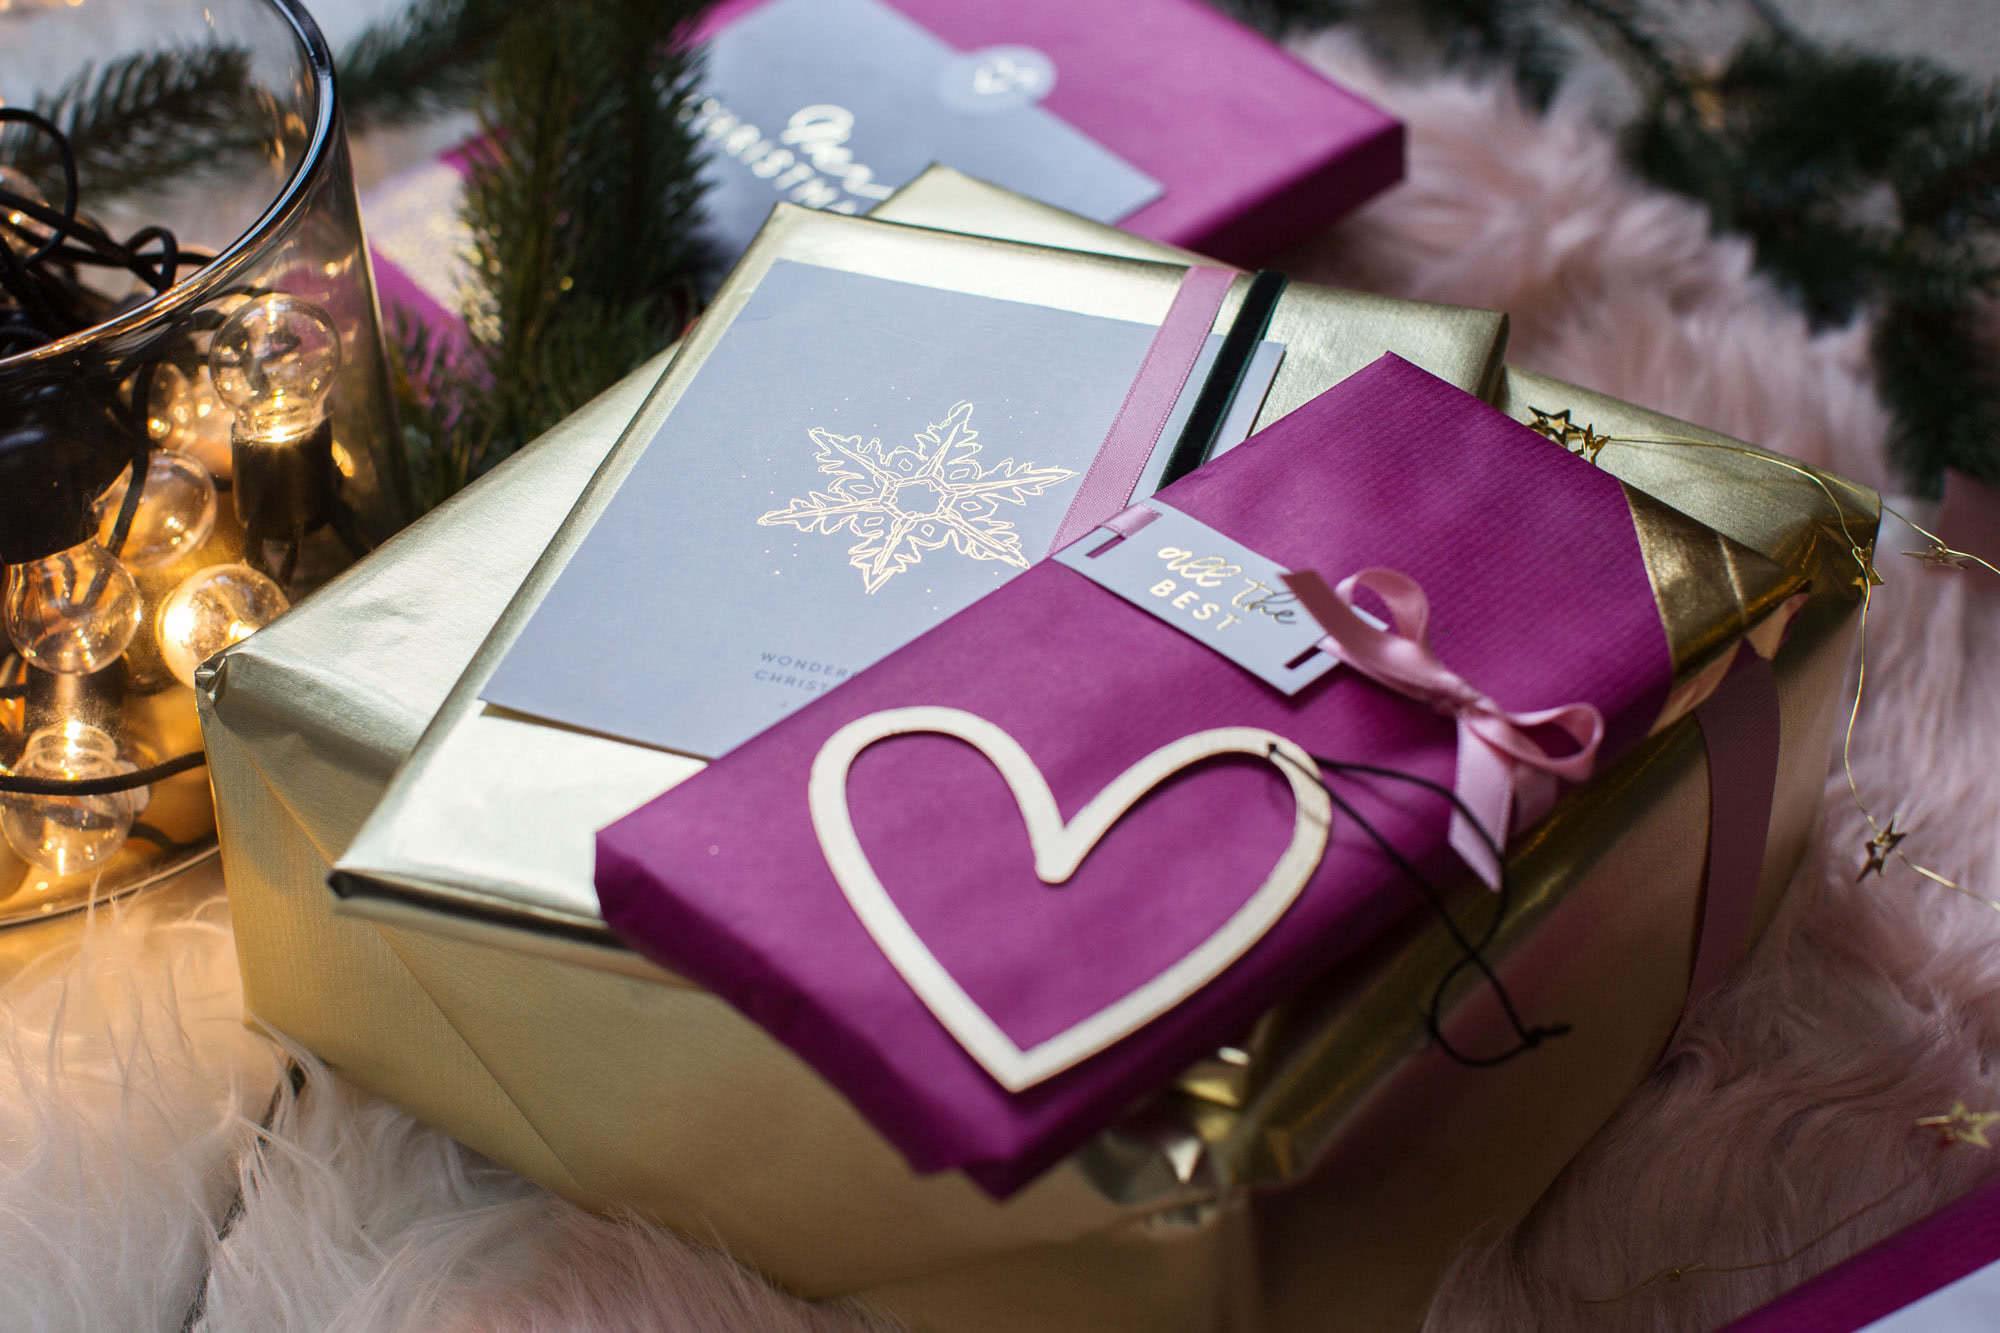 JO_and_JUDY_Magazin_Christmas_Inspiration_04.jpg